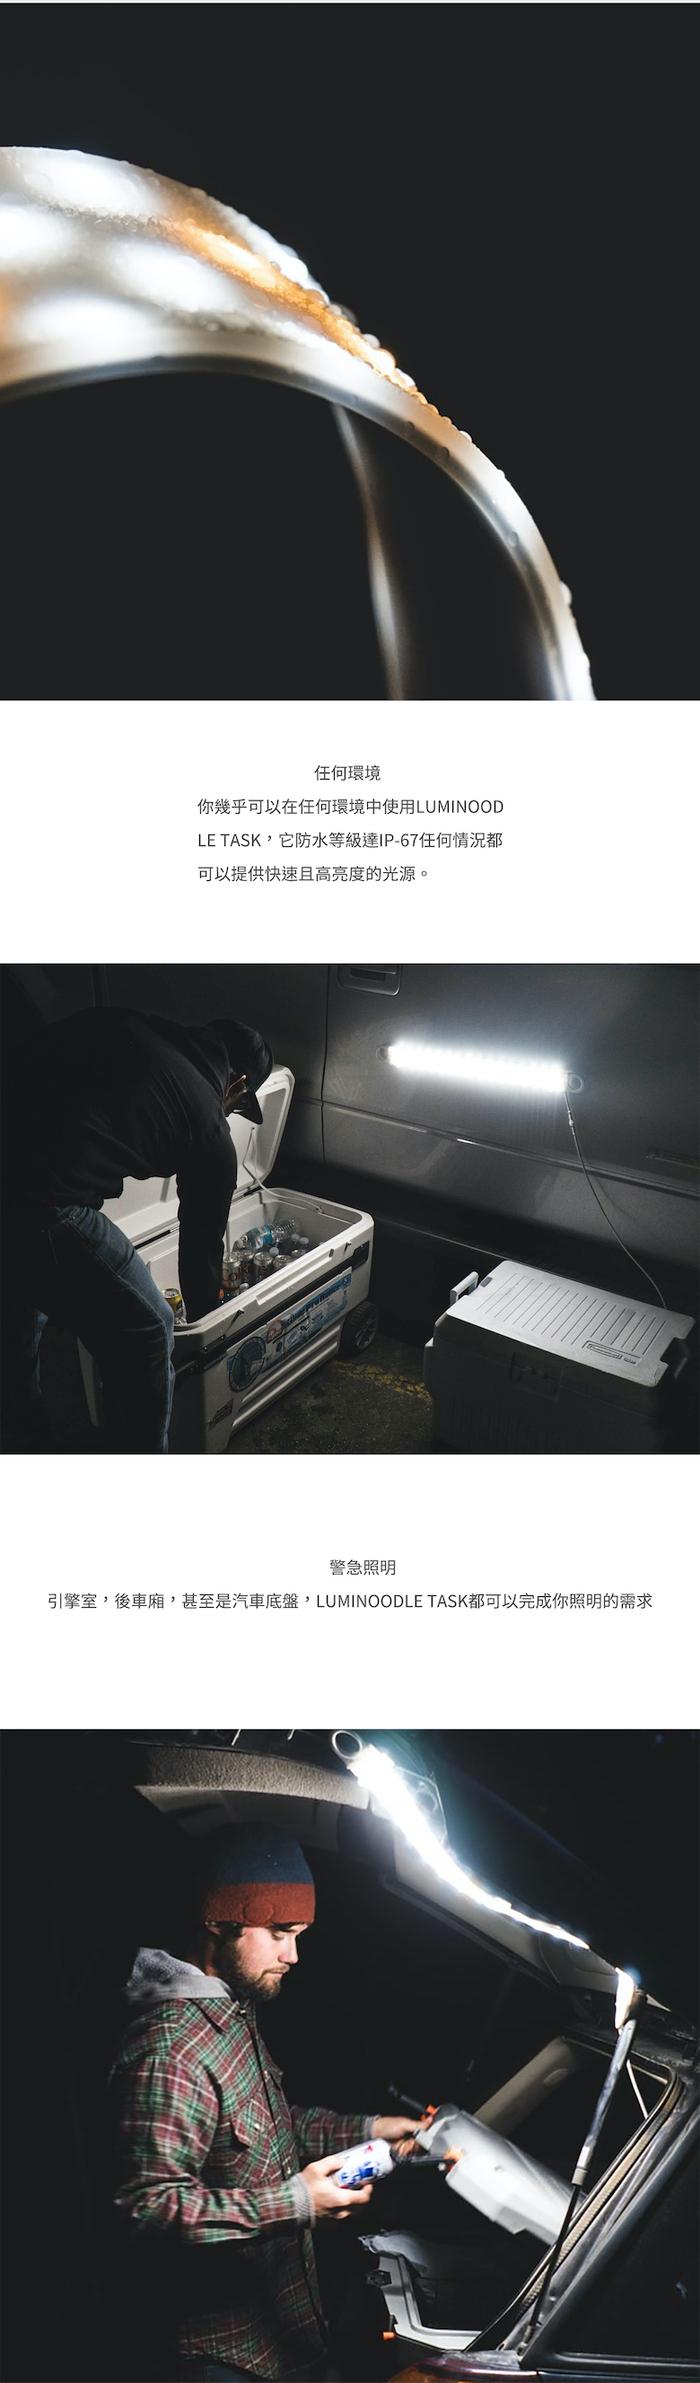 Luminoodle TASK 便攜式高亮露營LED燈條/USB供電